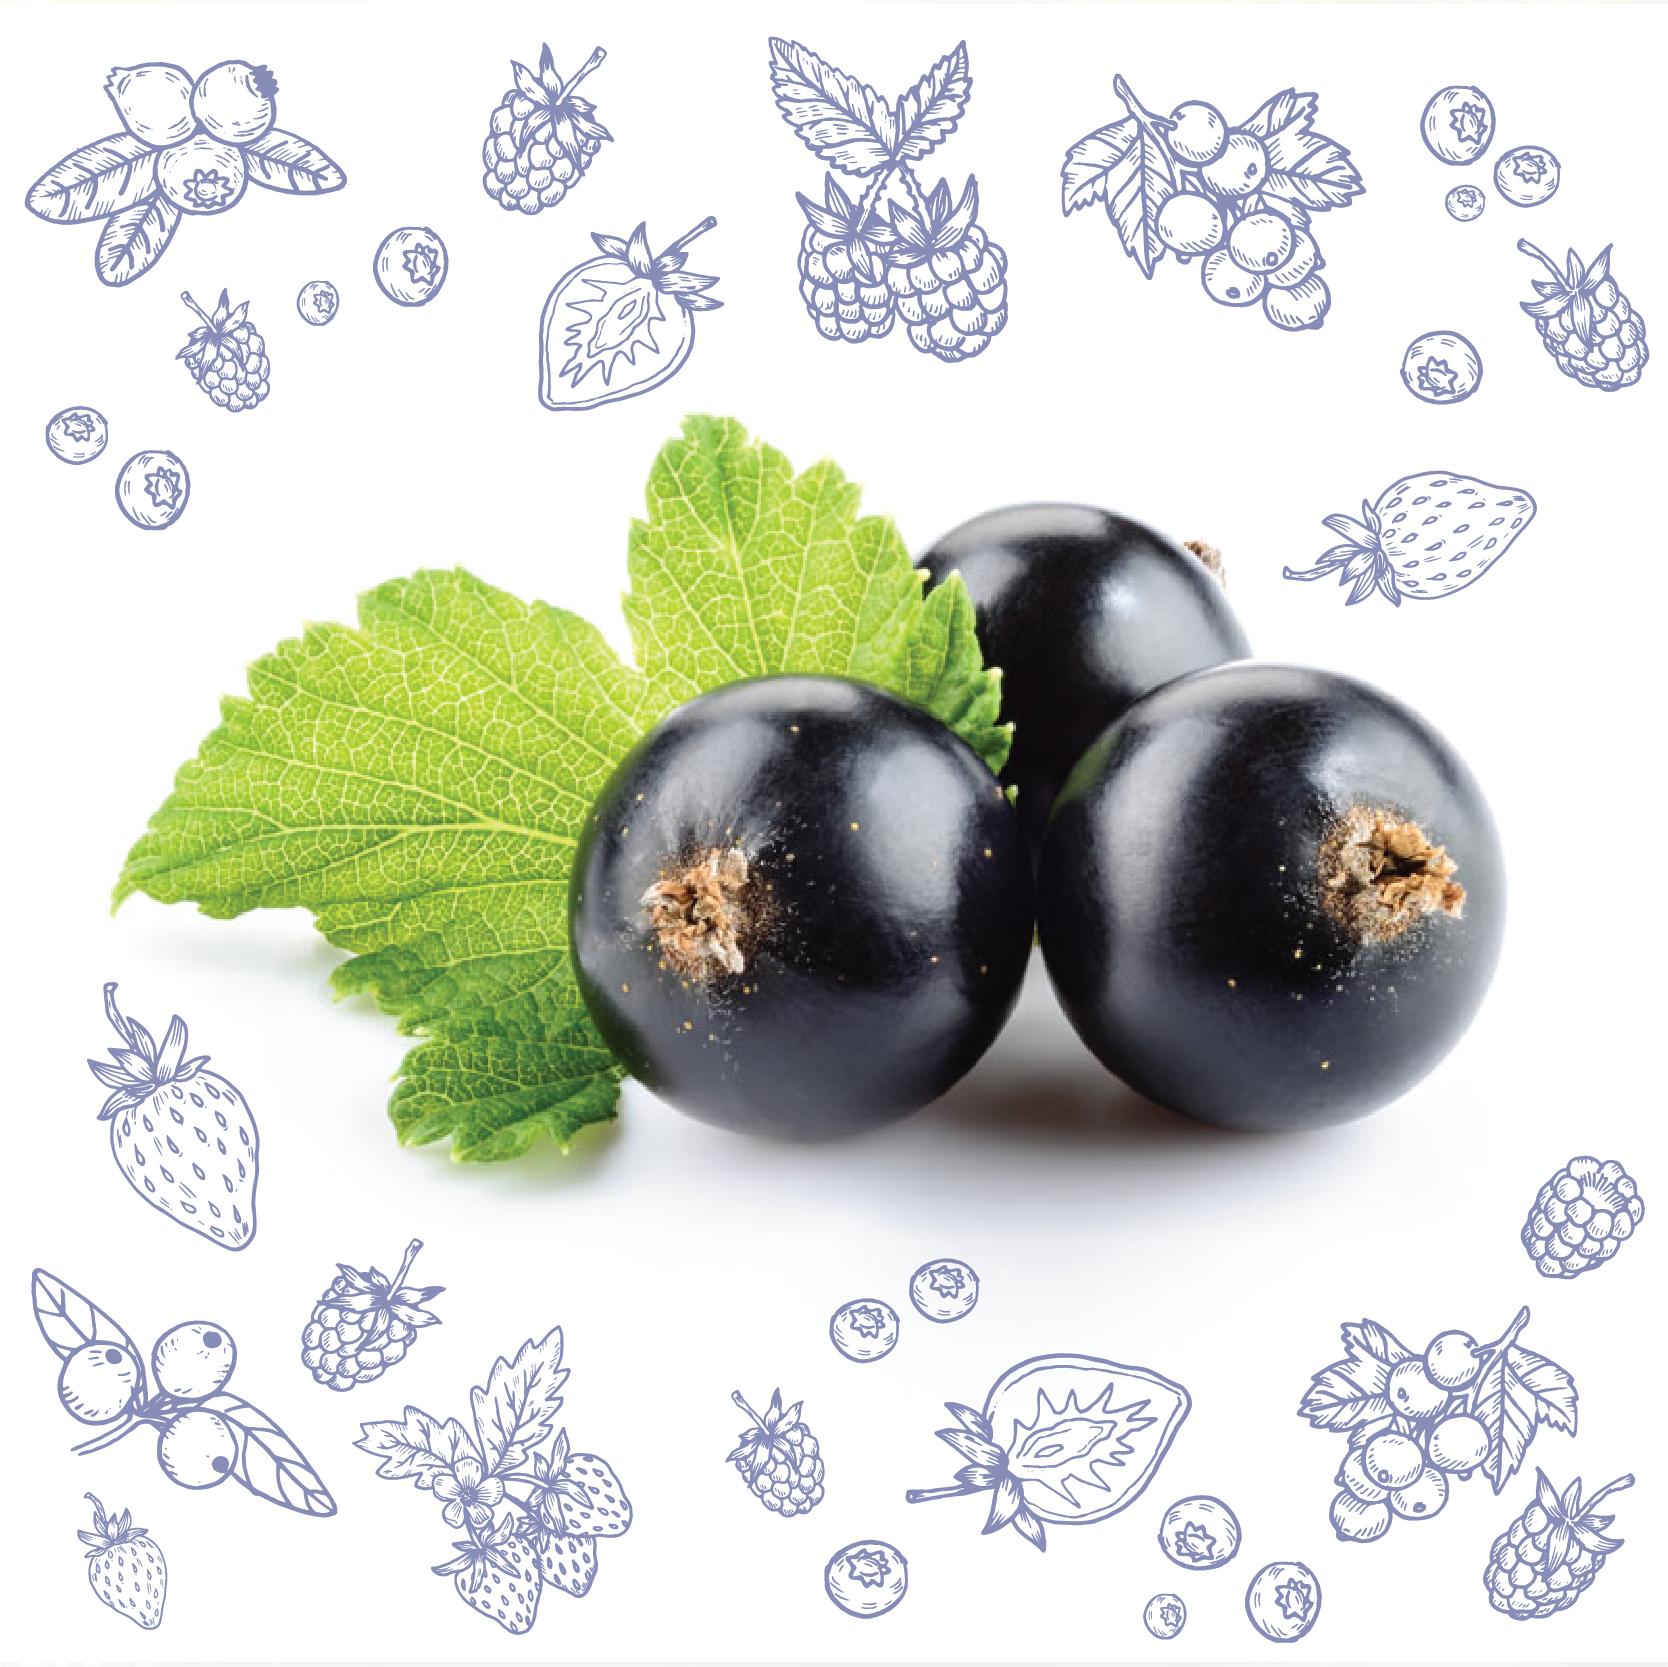 Polarica-Berries-blackcurrant